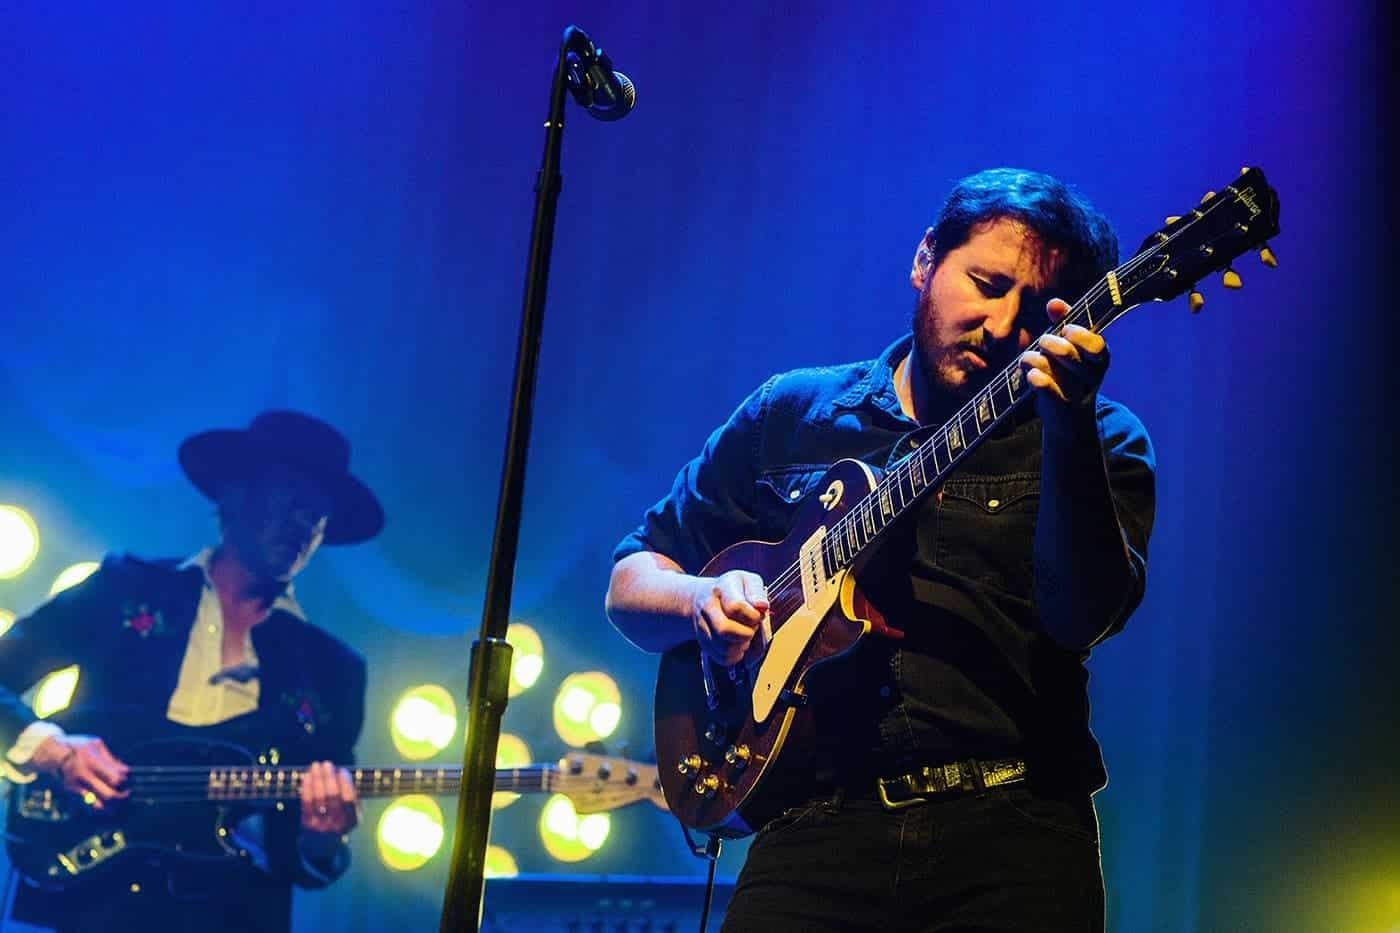 Nathaniel Rateliff & the Night Sweats guitarist